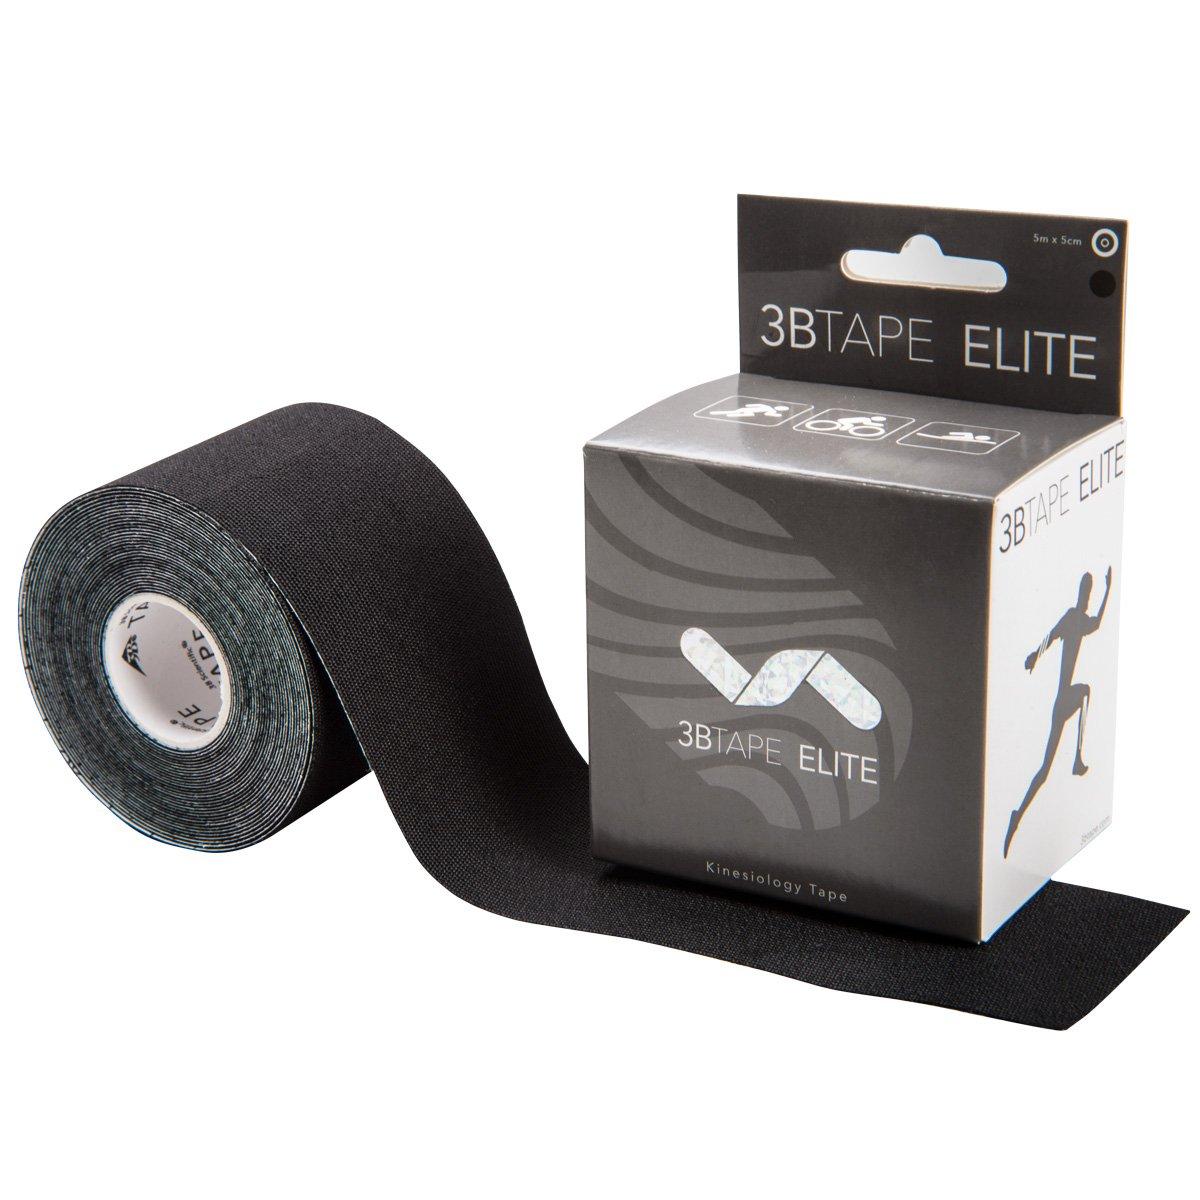 3B Scientific, 1018891, 3BTape ELITE Kinesiology Tape, Black, 16ft roll